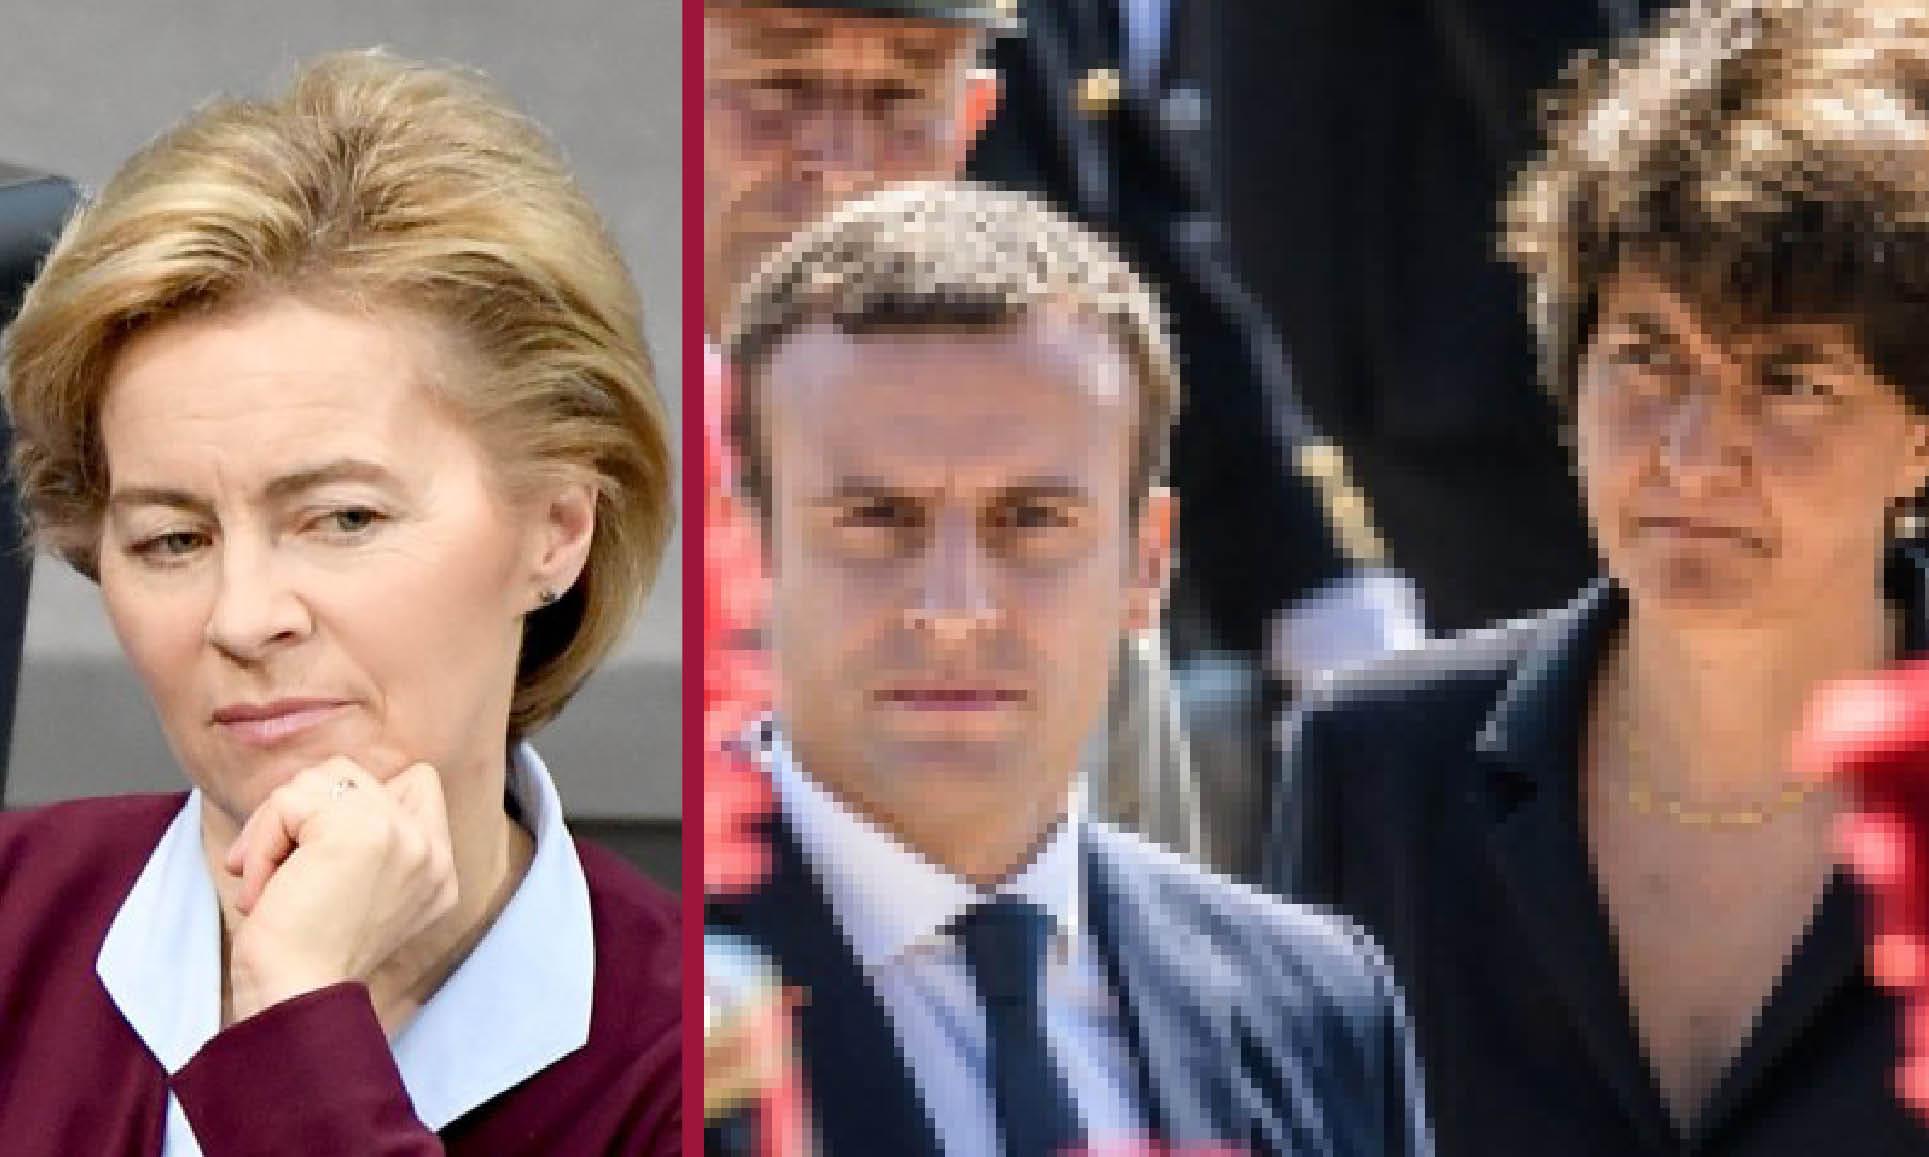 Storm in Brussels: under investigations the president Von der Leyen and 3 next EU Ministers